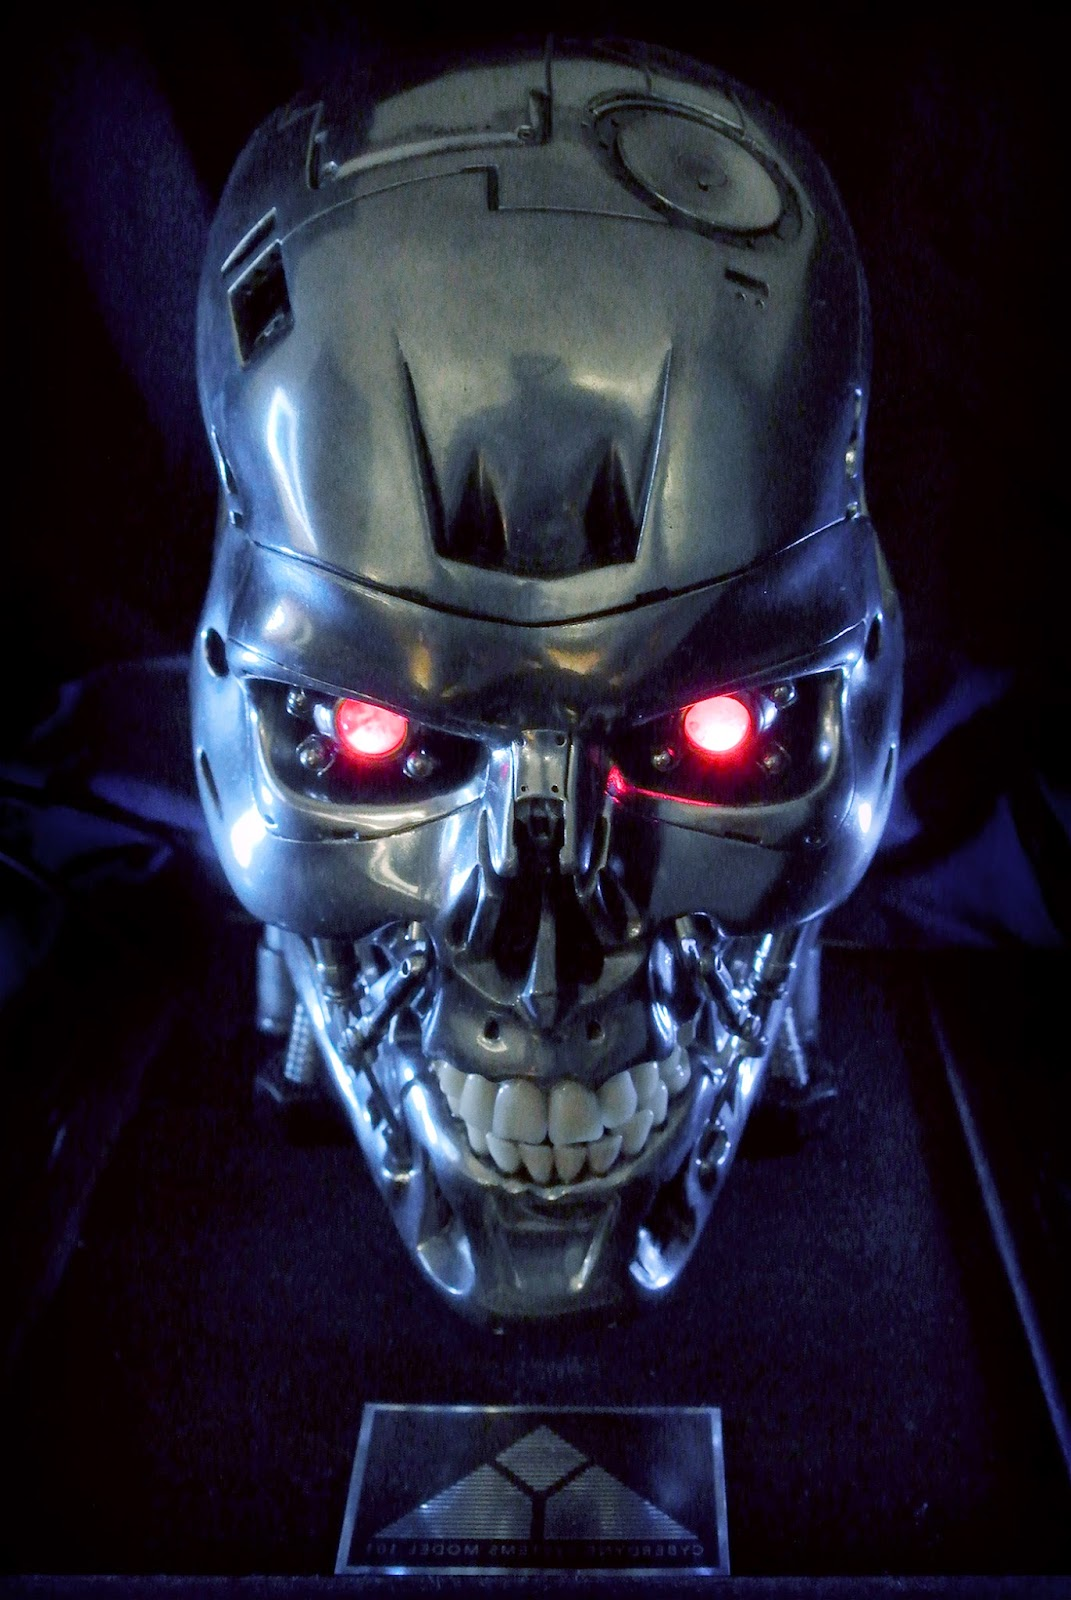 T800-101  Buildi...T 800 Terminator Skull